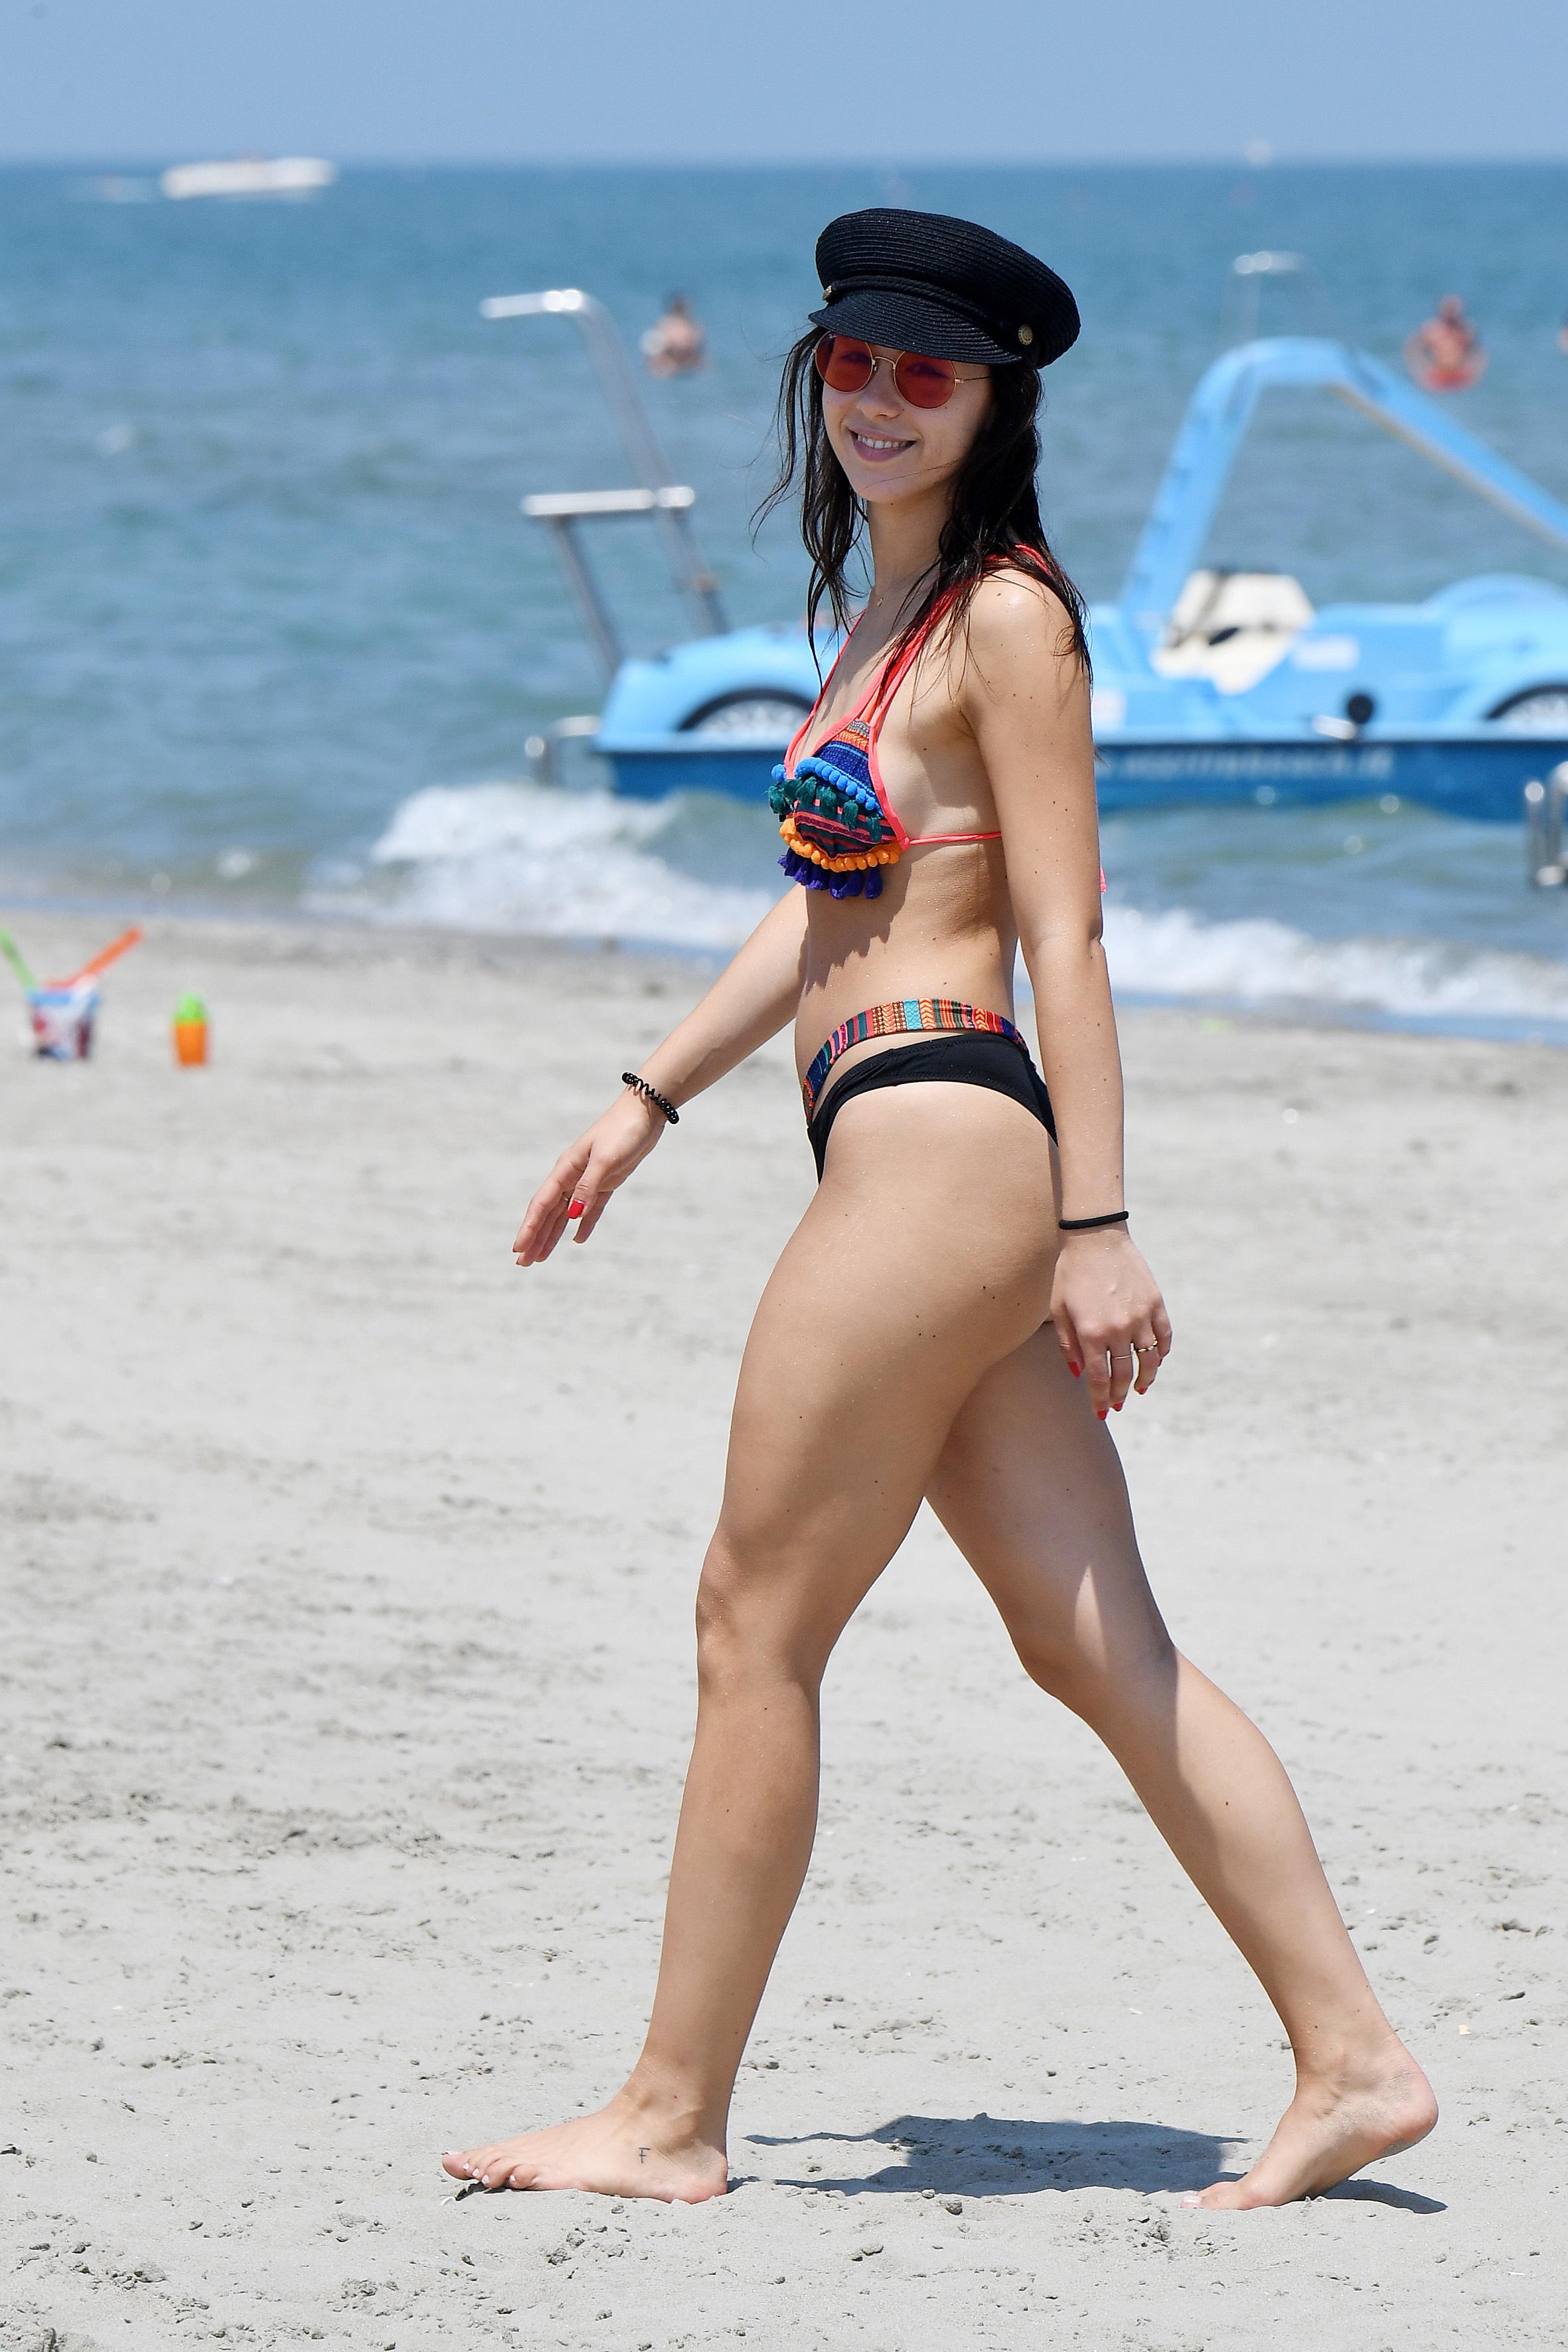 Bikini Aurora Ramazzotti nudes (74 photo), Sexy, Bikini, Twitter, braless 2020